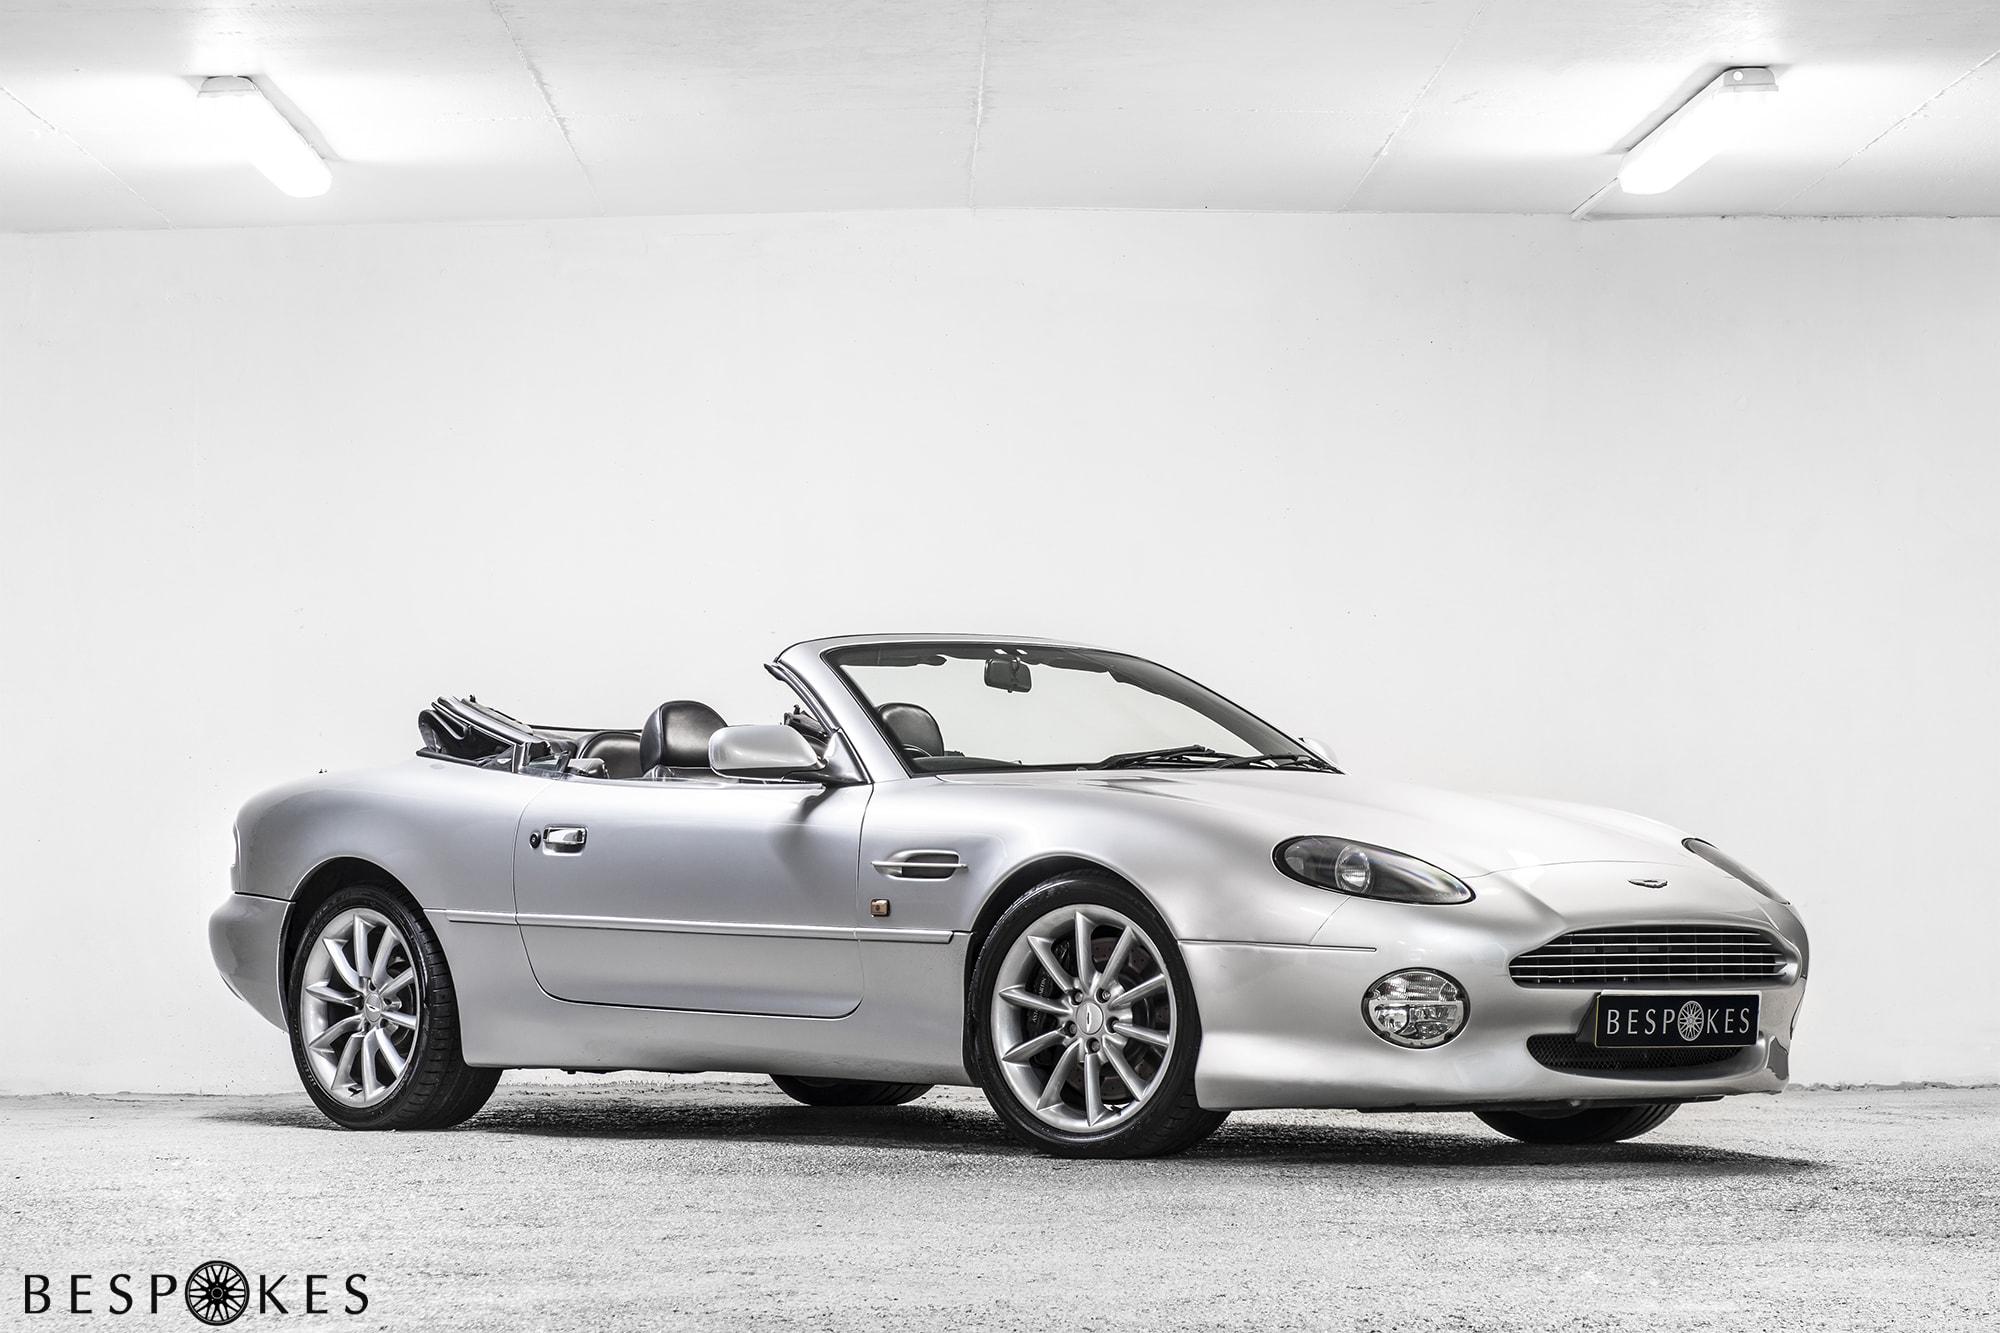 Aston Martin Db7 Bespokes